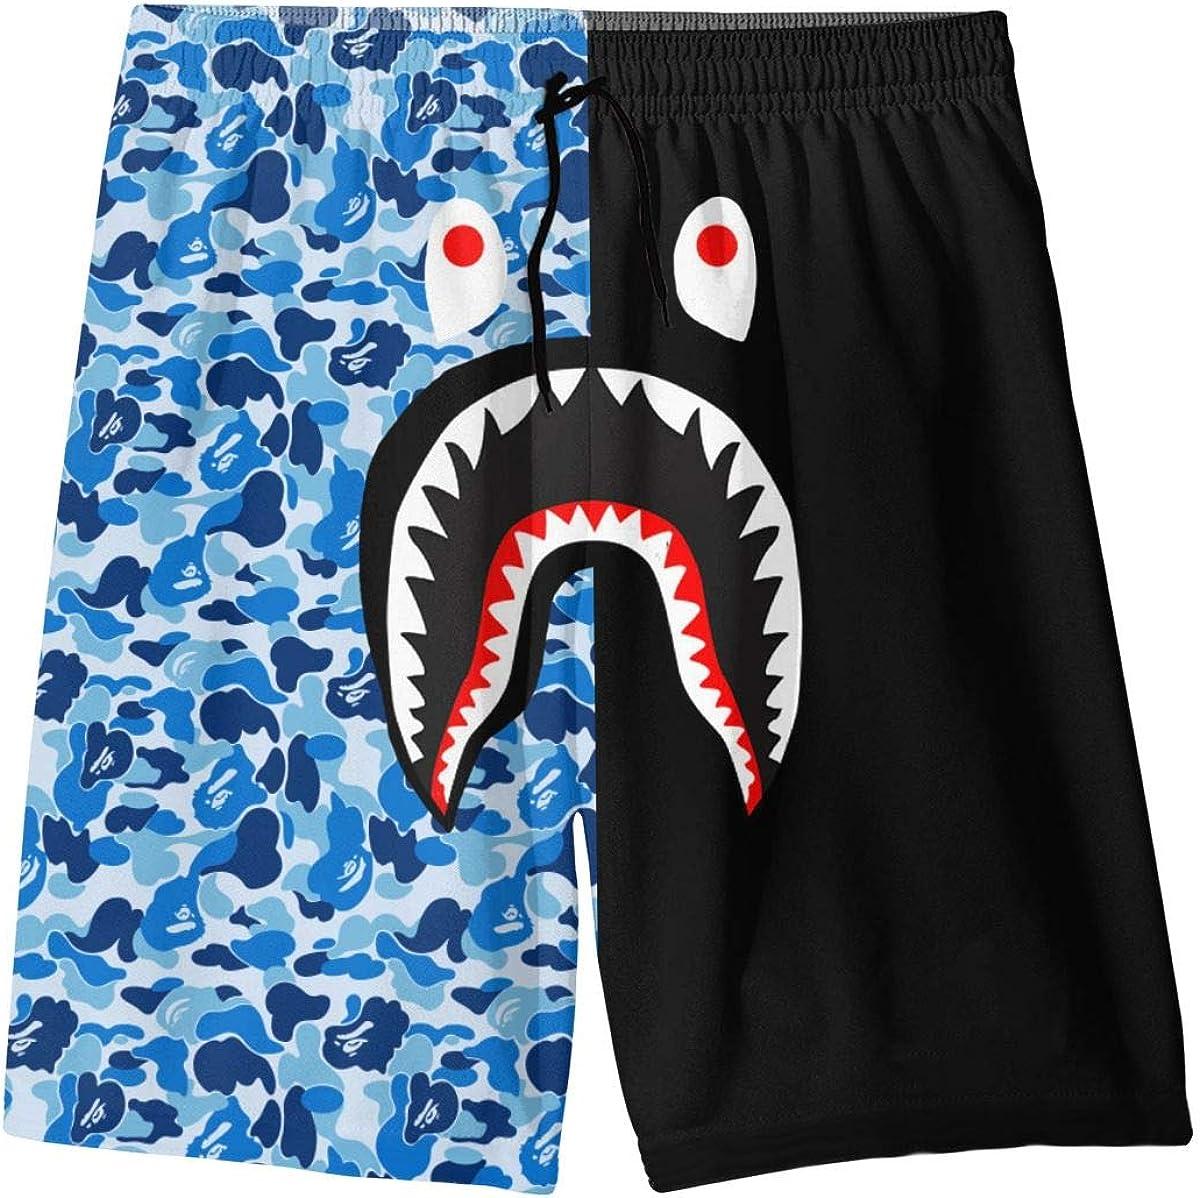 Bape Blood Shark Youth Boys' Shorts Summer Beach Casual Pants Swim Trunk Quick Dry